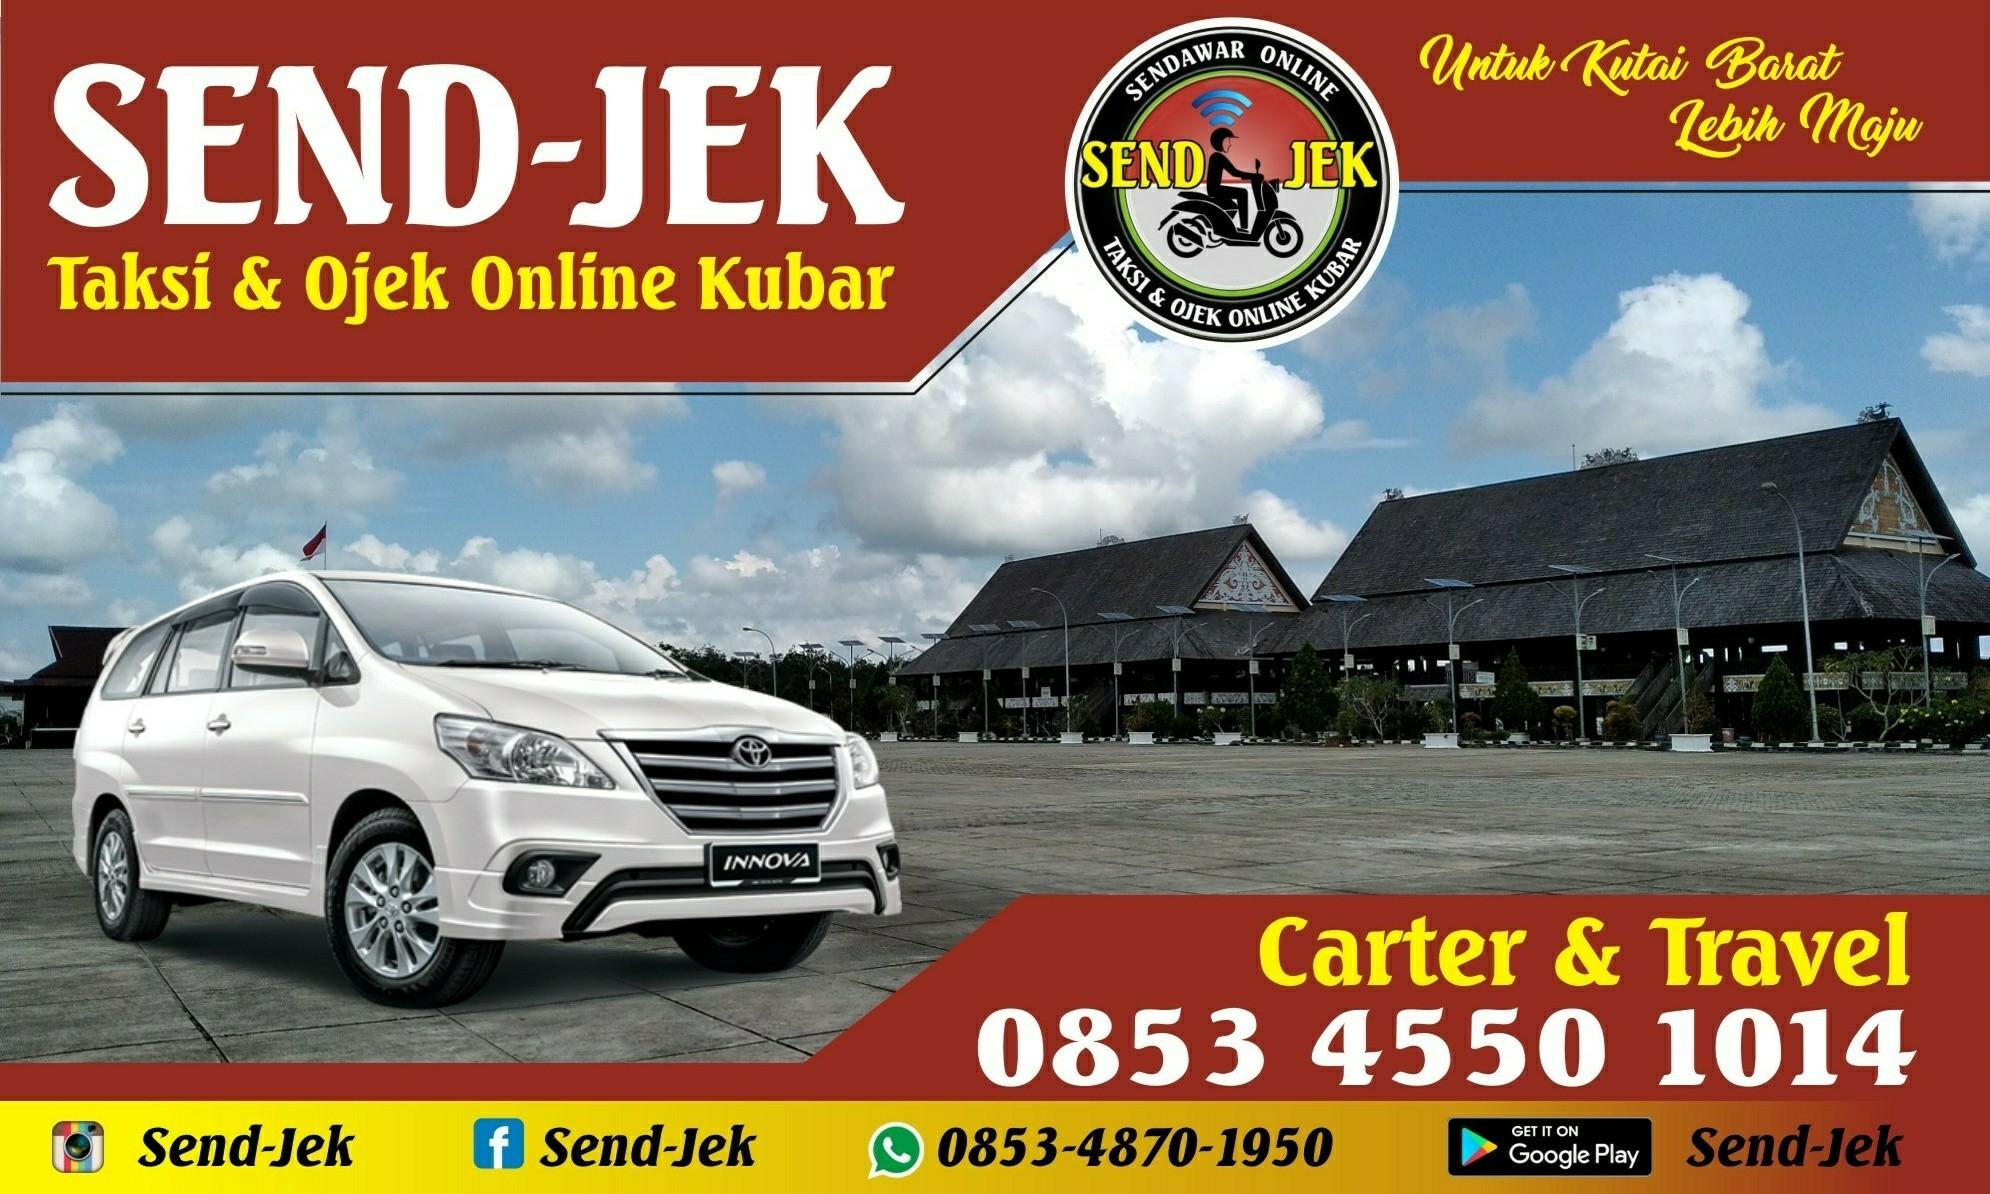 Send-Jek 4